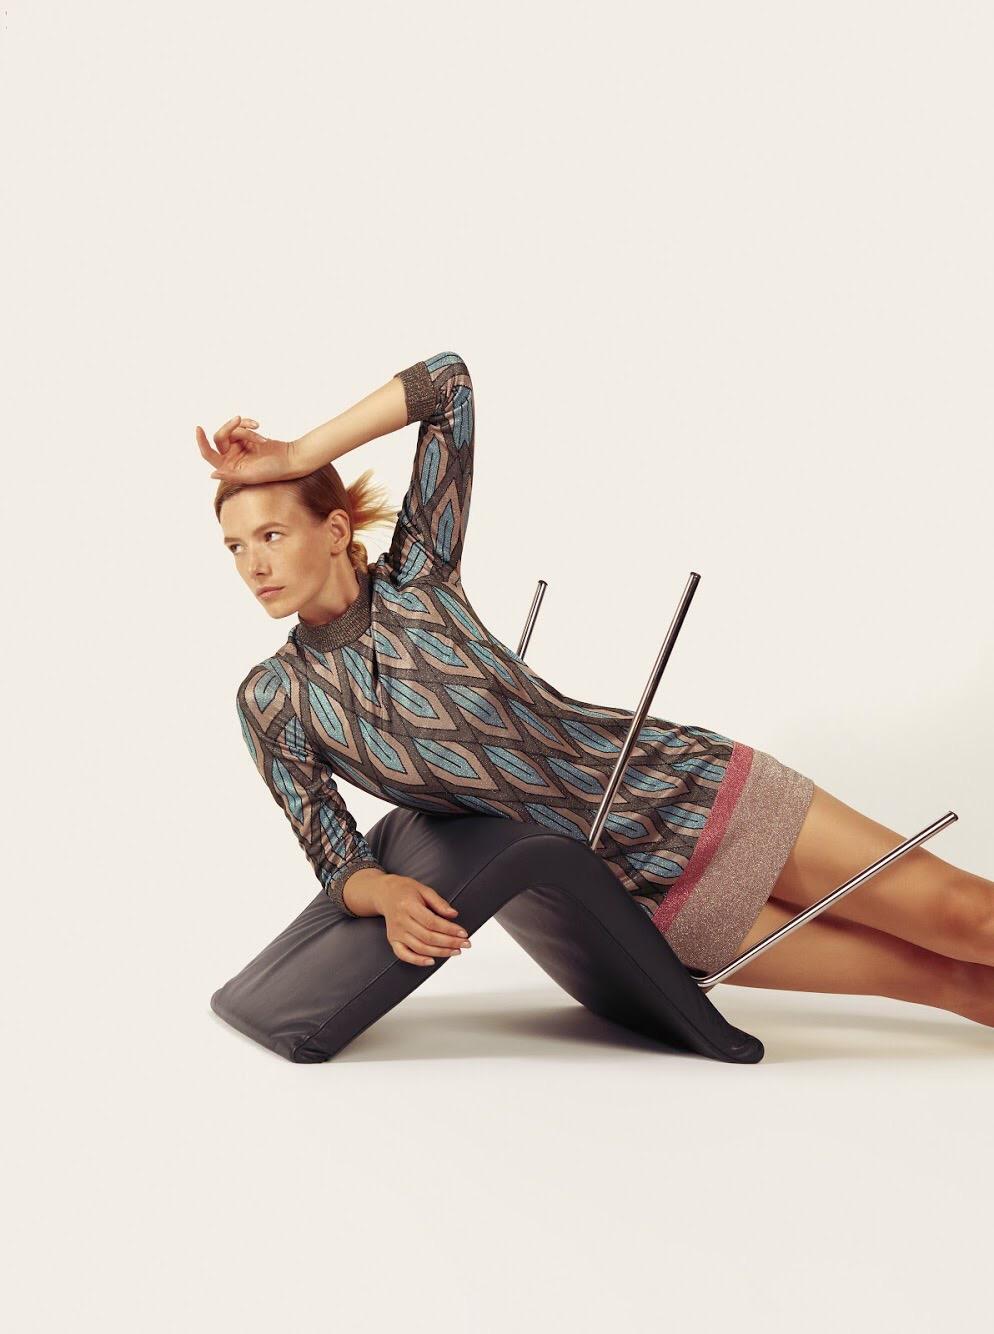 Что будет модно в сезоне осень-зима 18/19: идеи из лукбука Victoria Gres-320x180